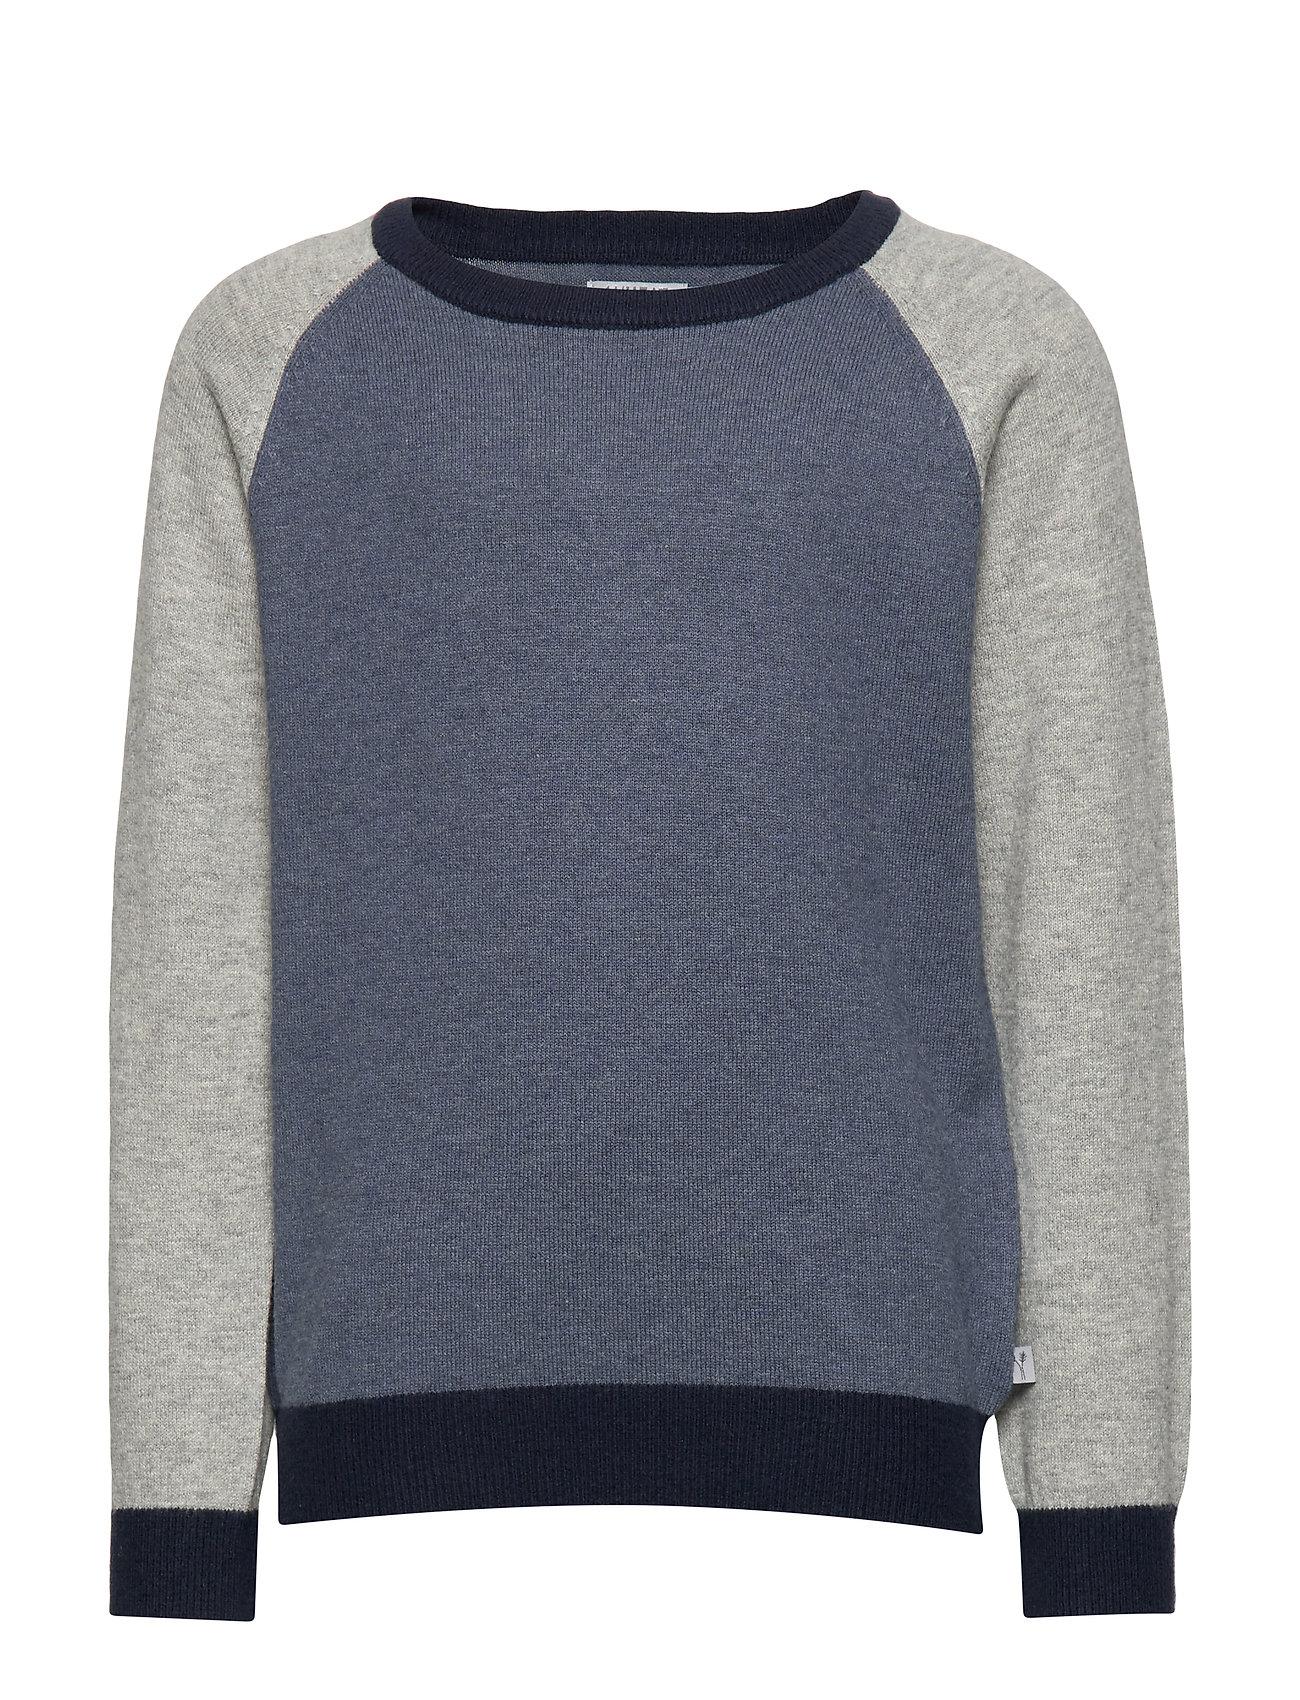 Wheat Knit Pullover Flemming - GREYBLUE MELANGE